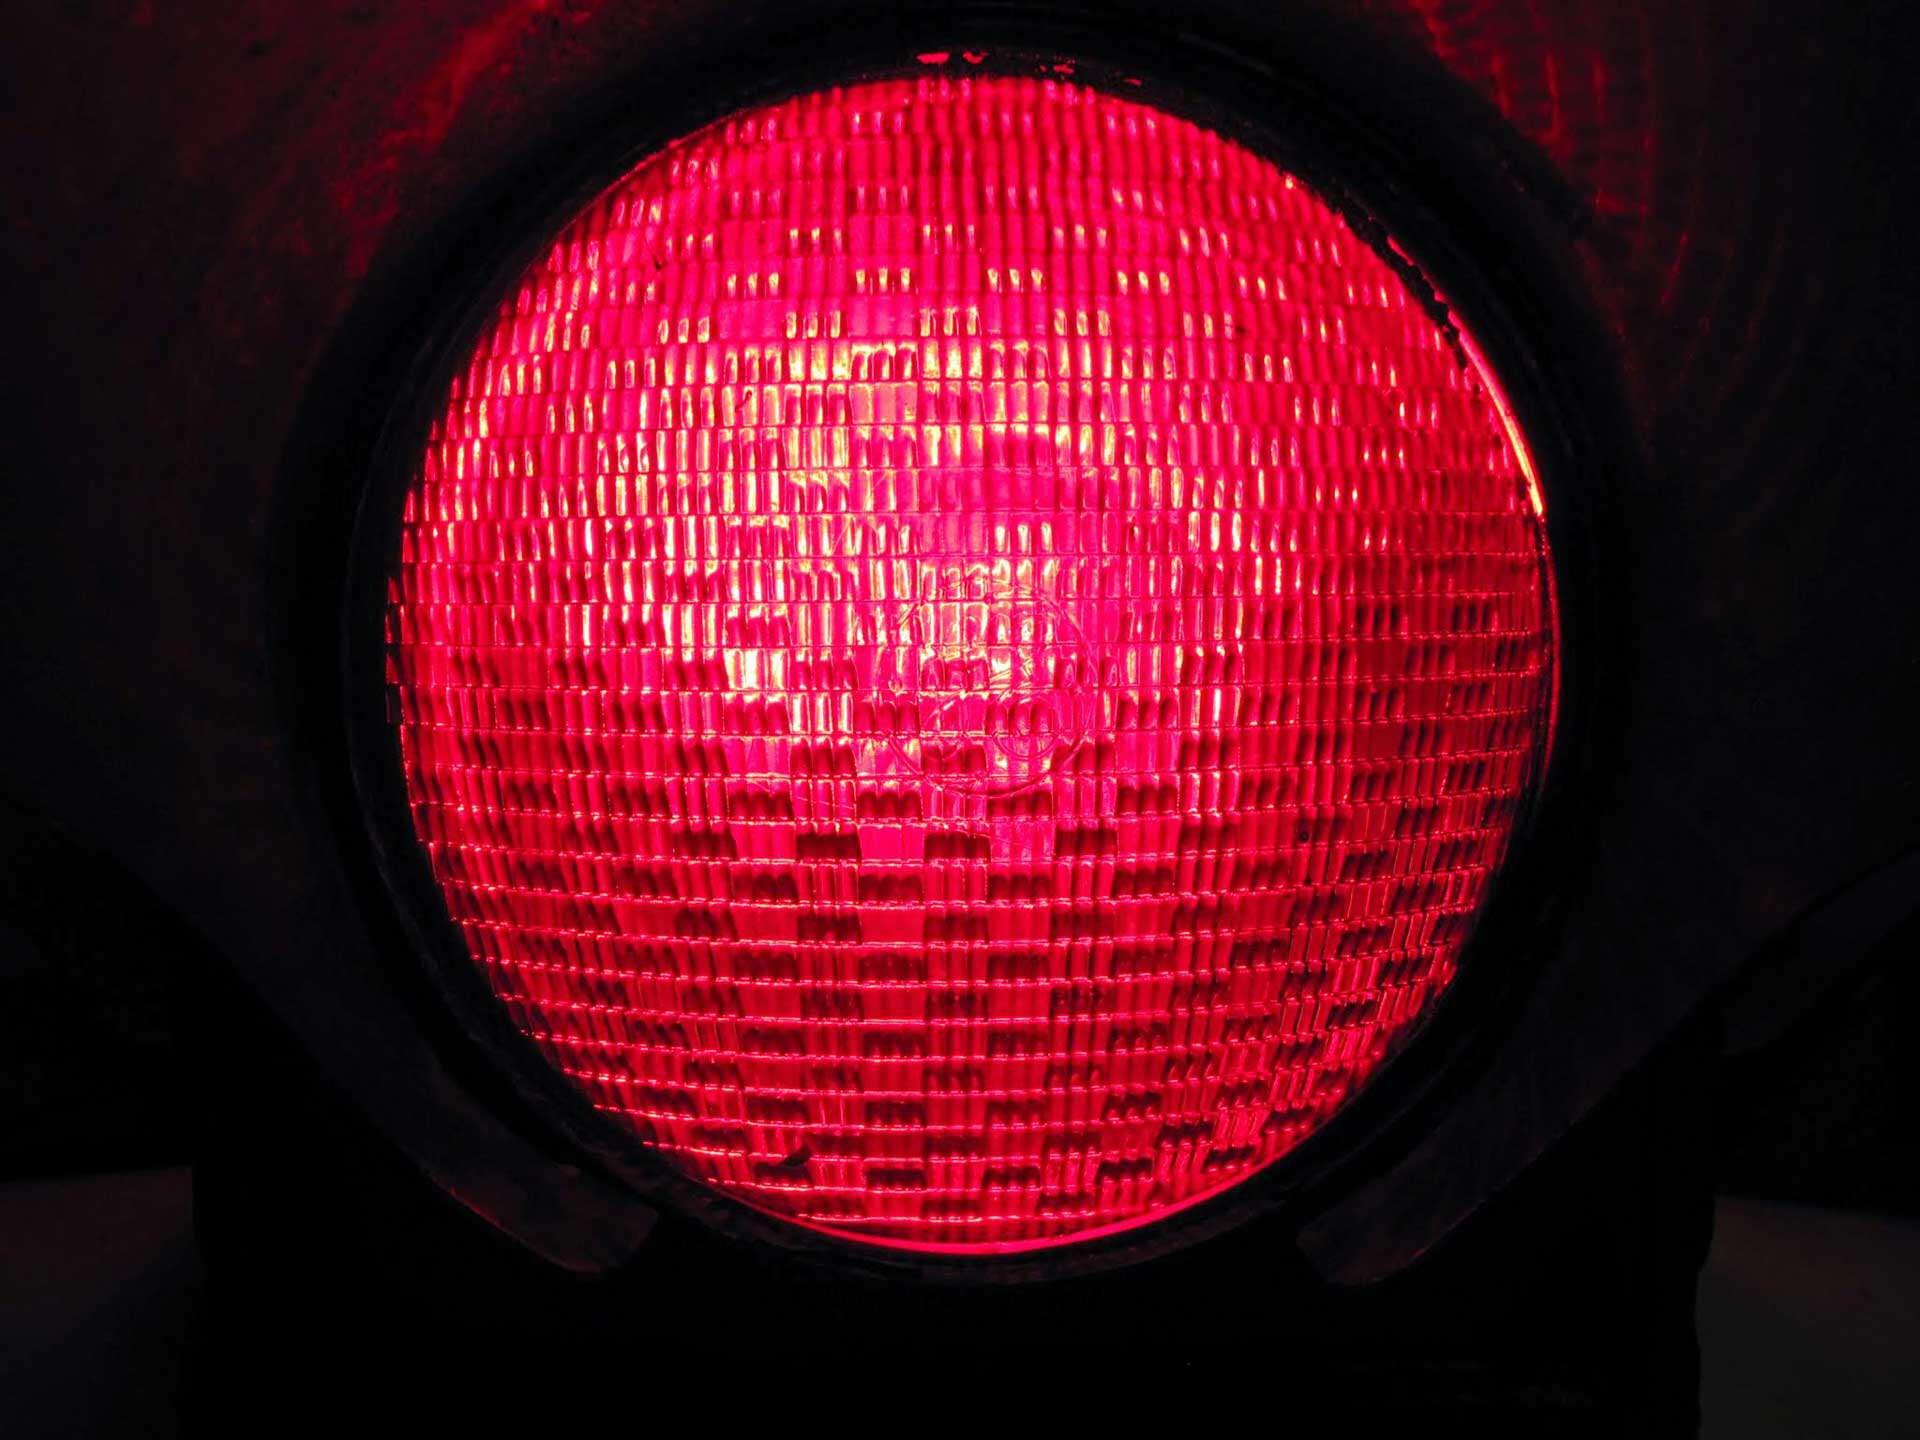 Red GE traffic signal lens